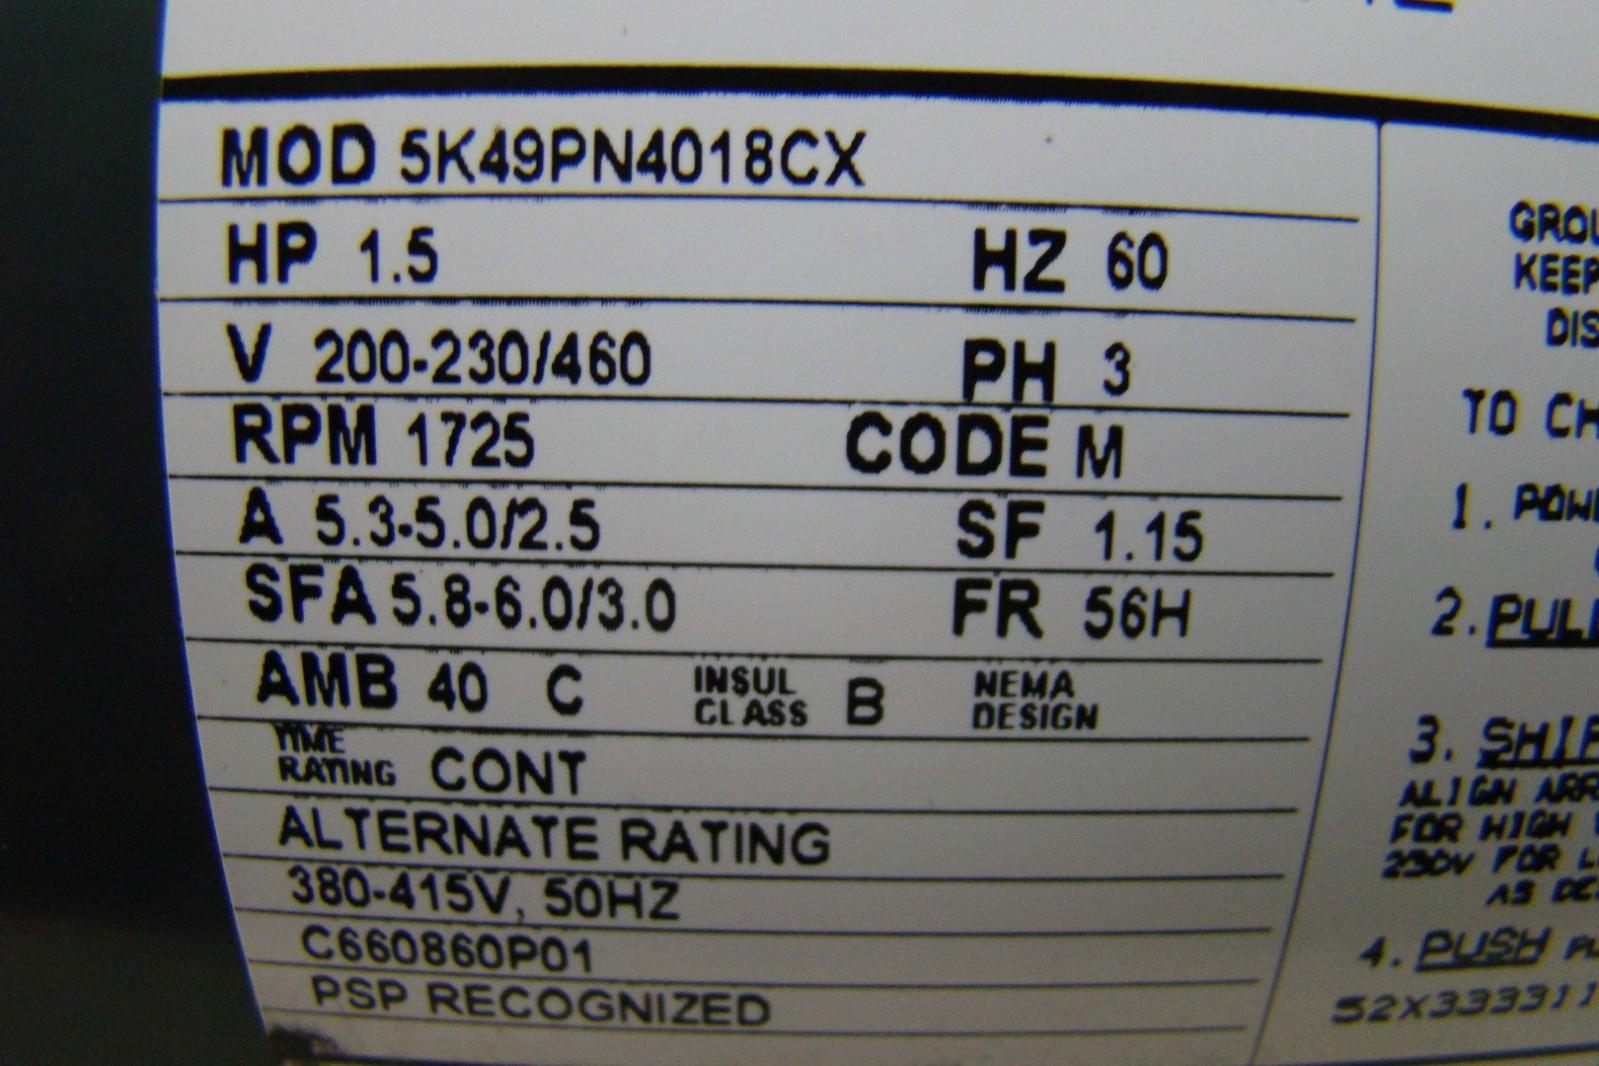 Marathon Electric Motor 1 1 2 Hp 200 230 460v 5k49pn4018cx